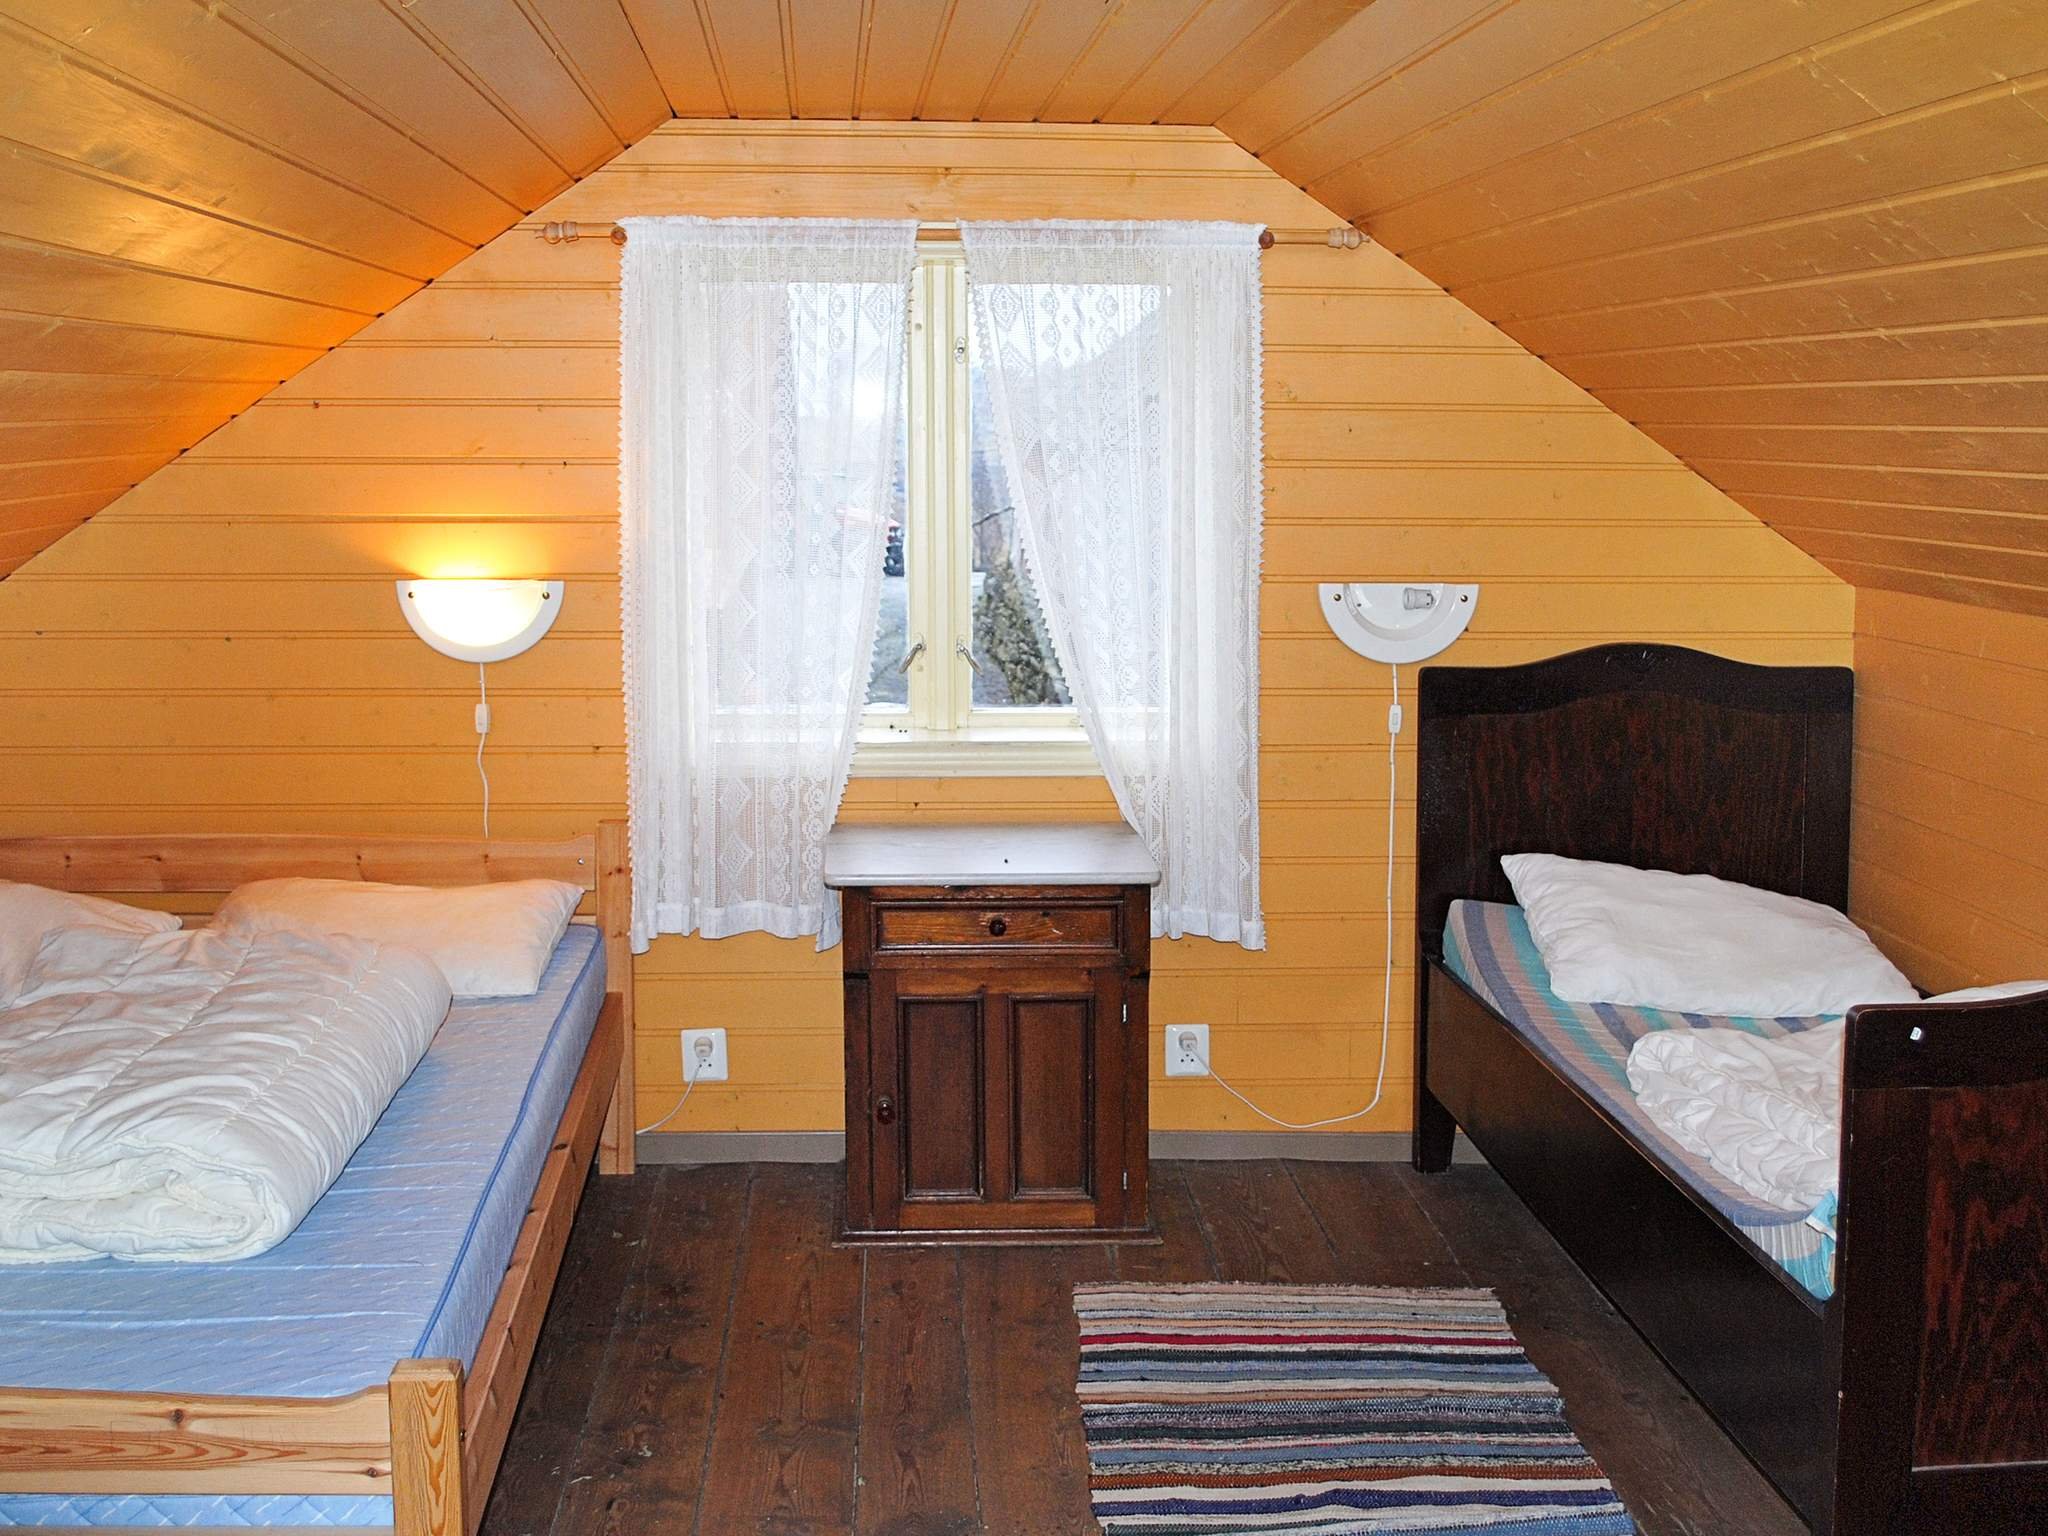 Ferienhaus Etne (83639), Etne, Hordaland - Hardangerfjord, Westnorwegen, Norwegen, Bild 11